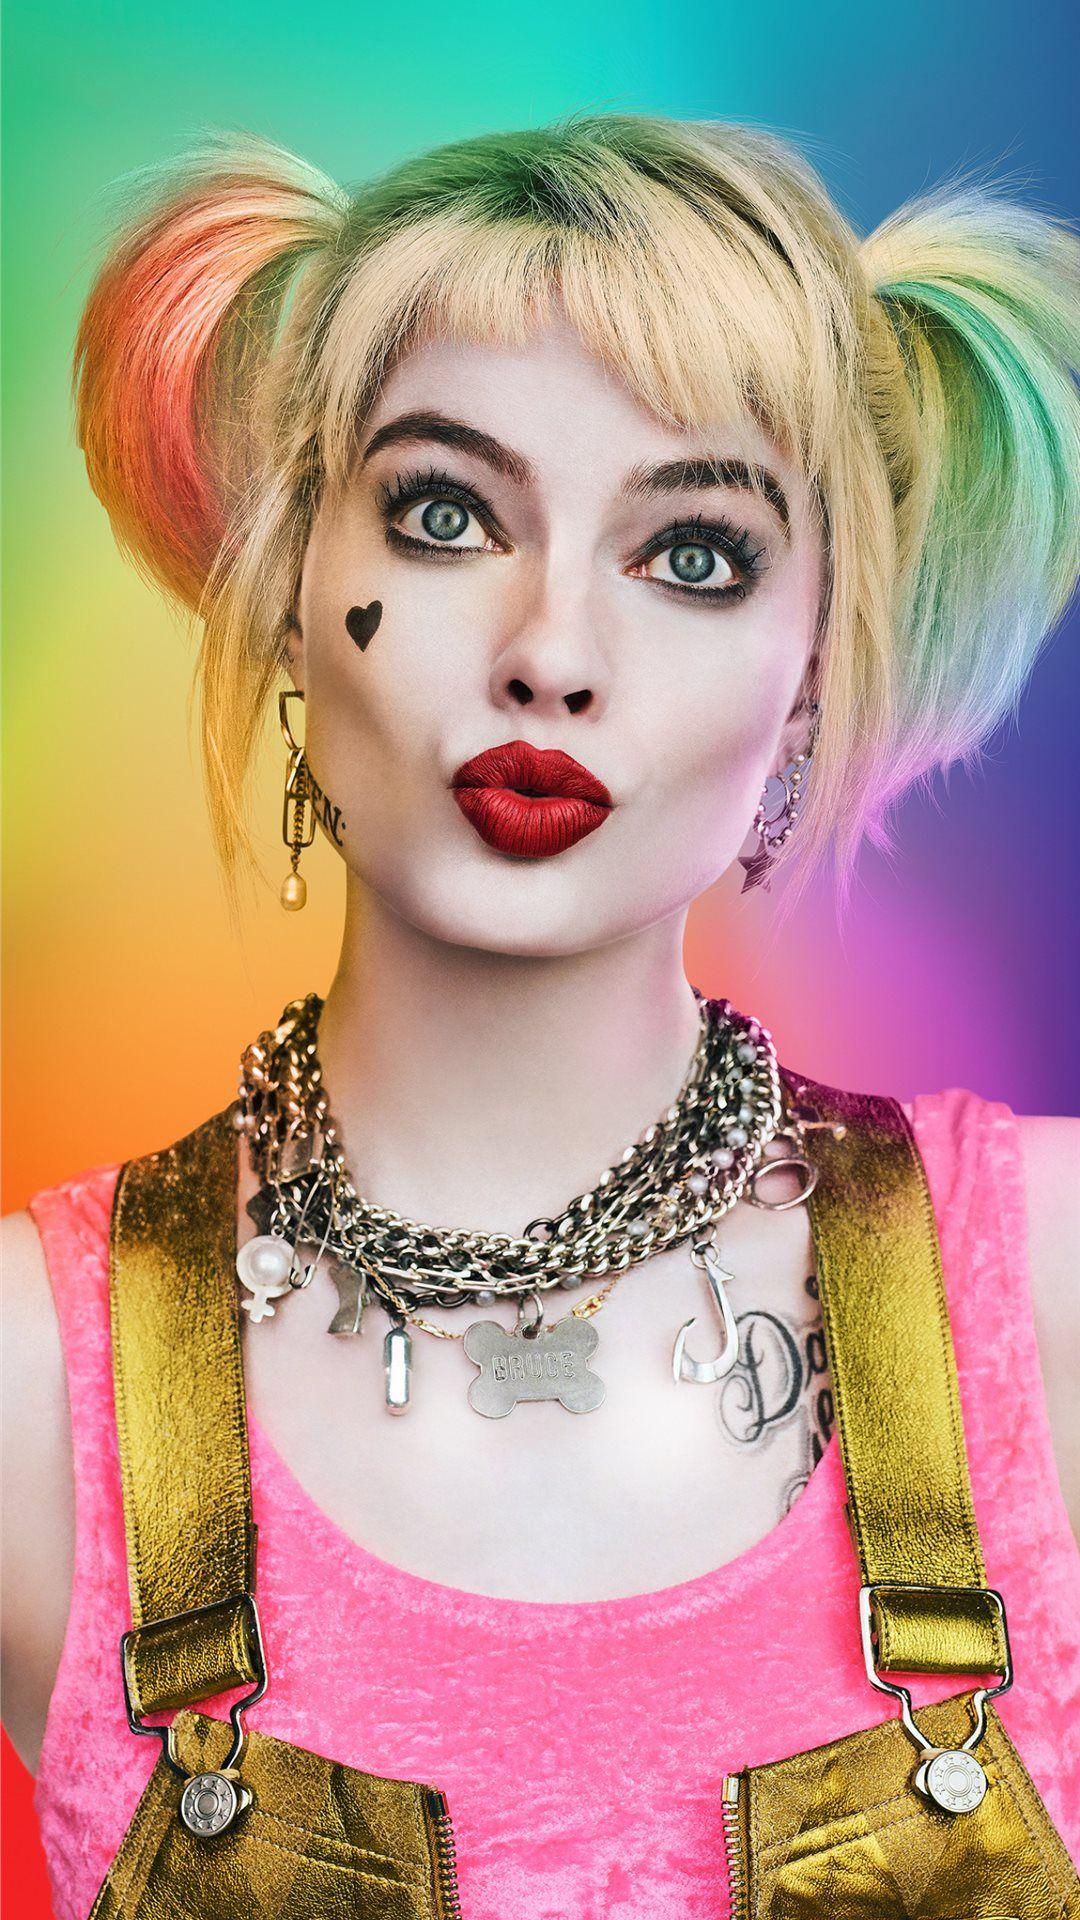 Harley Quinn Mobile Wallpapers - Wallpaper Cave